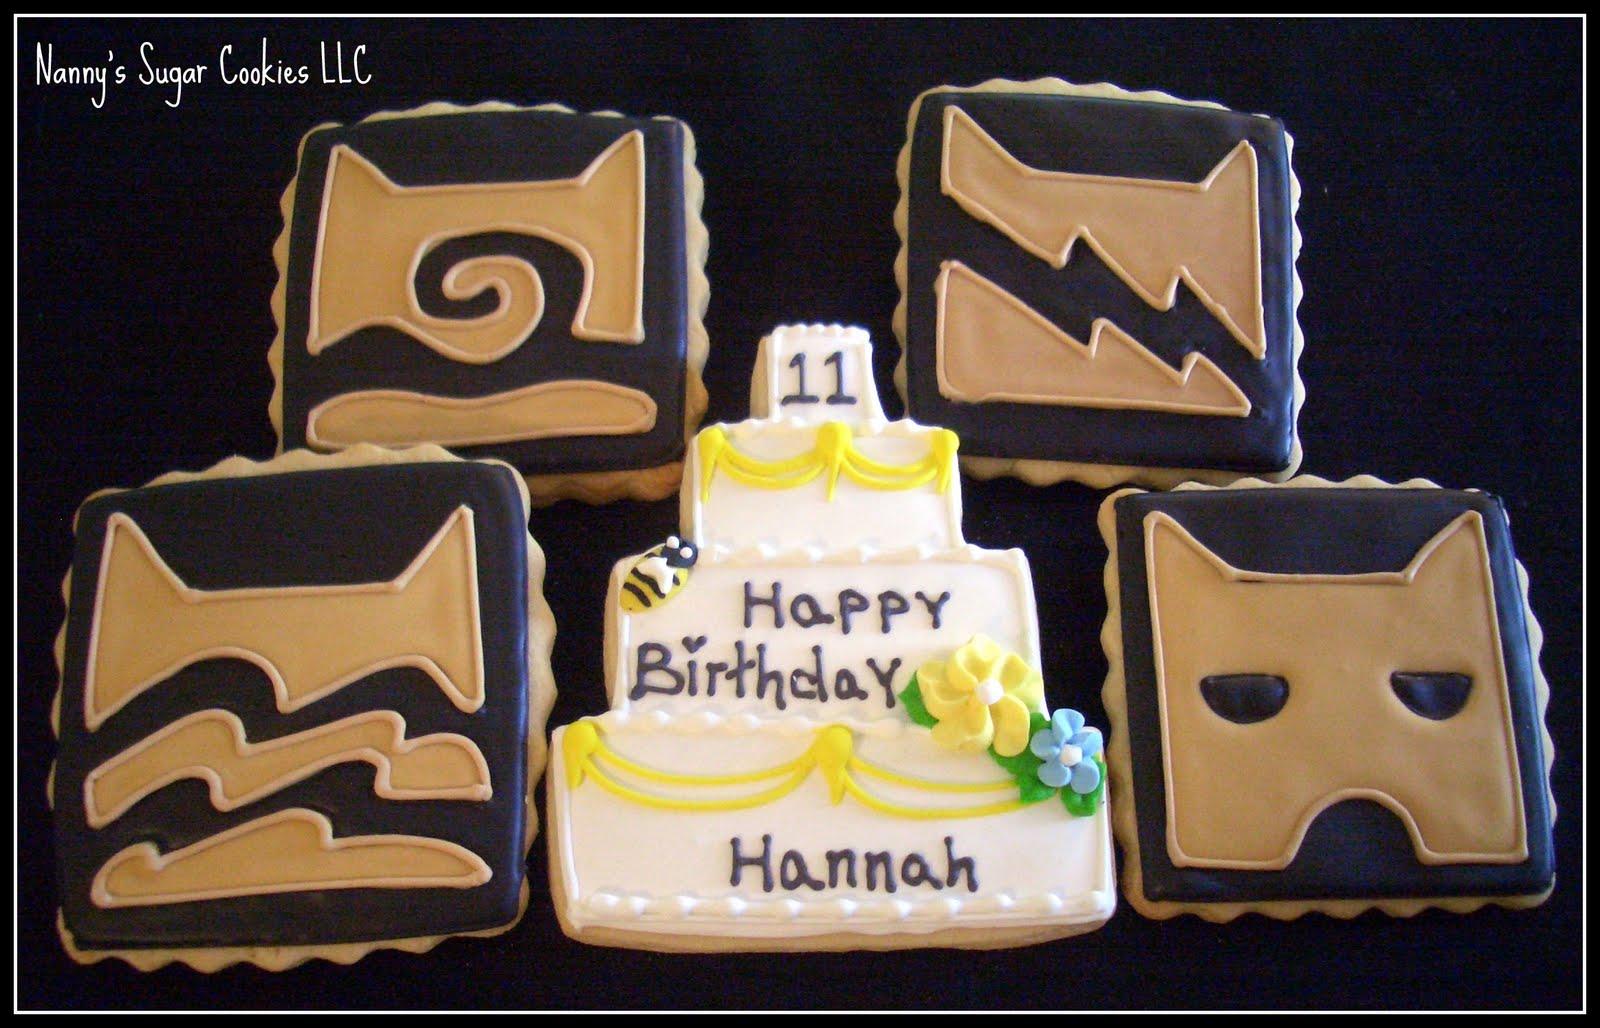 Nannys Sugar Cookies Llc Happy Birthday